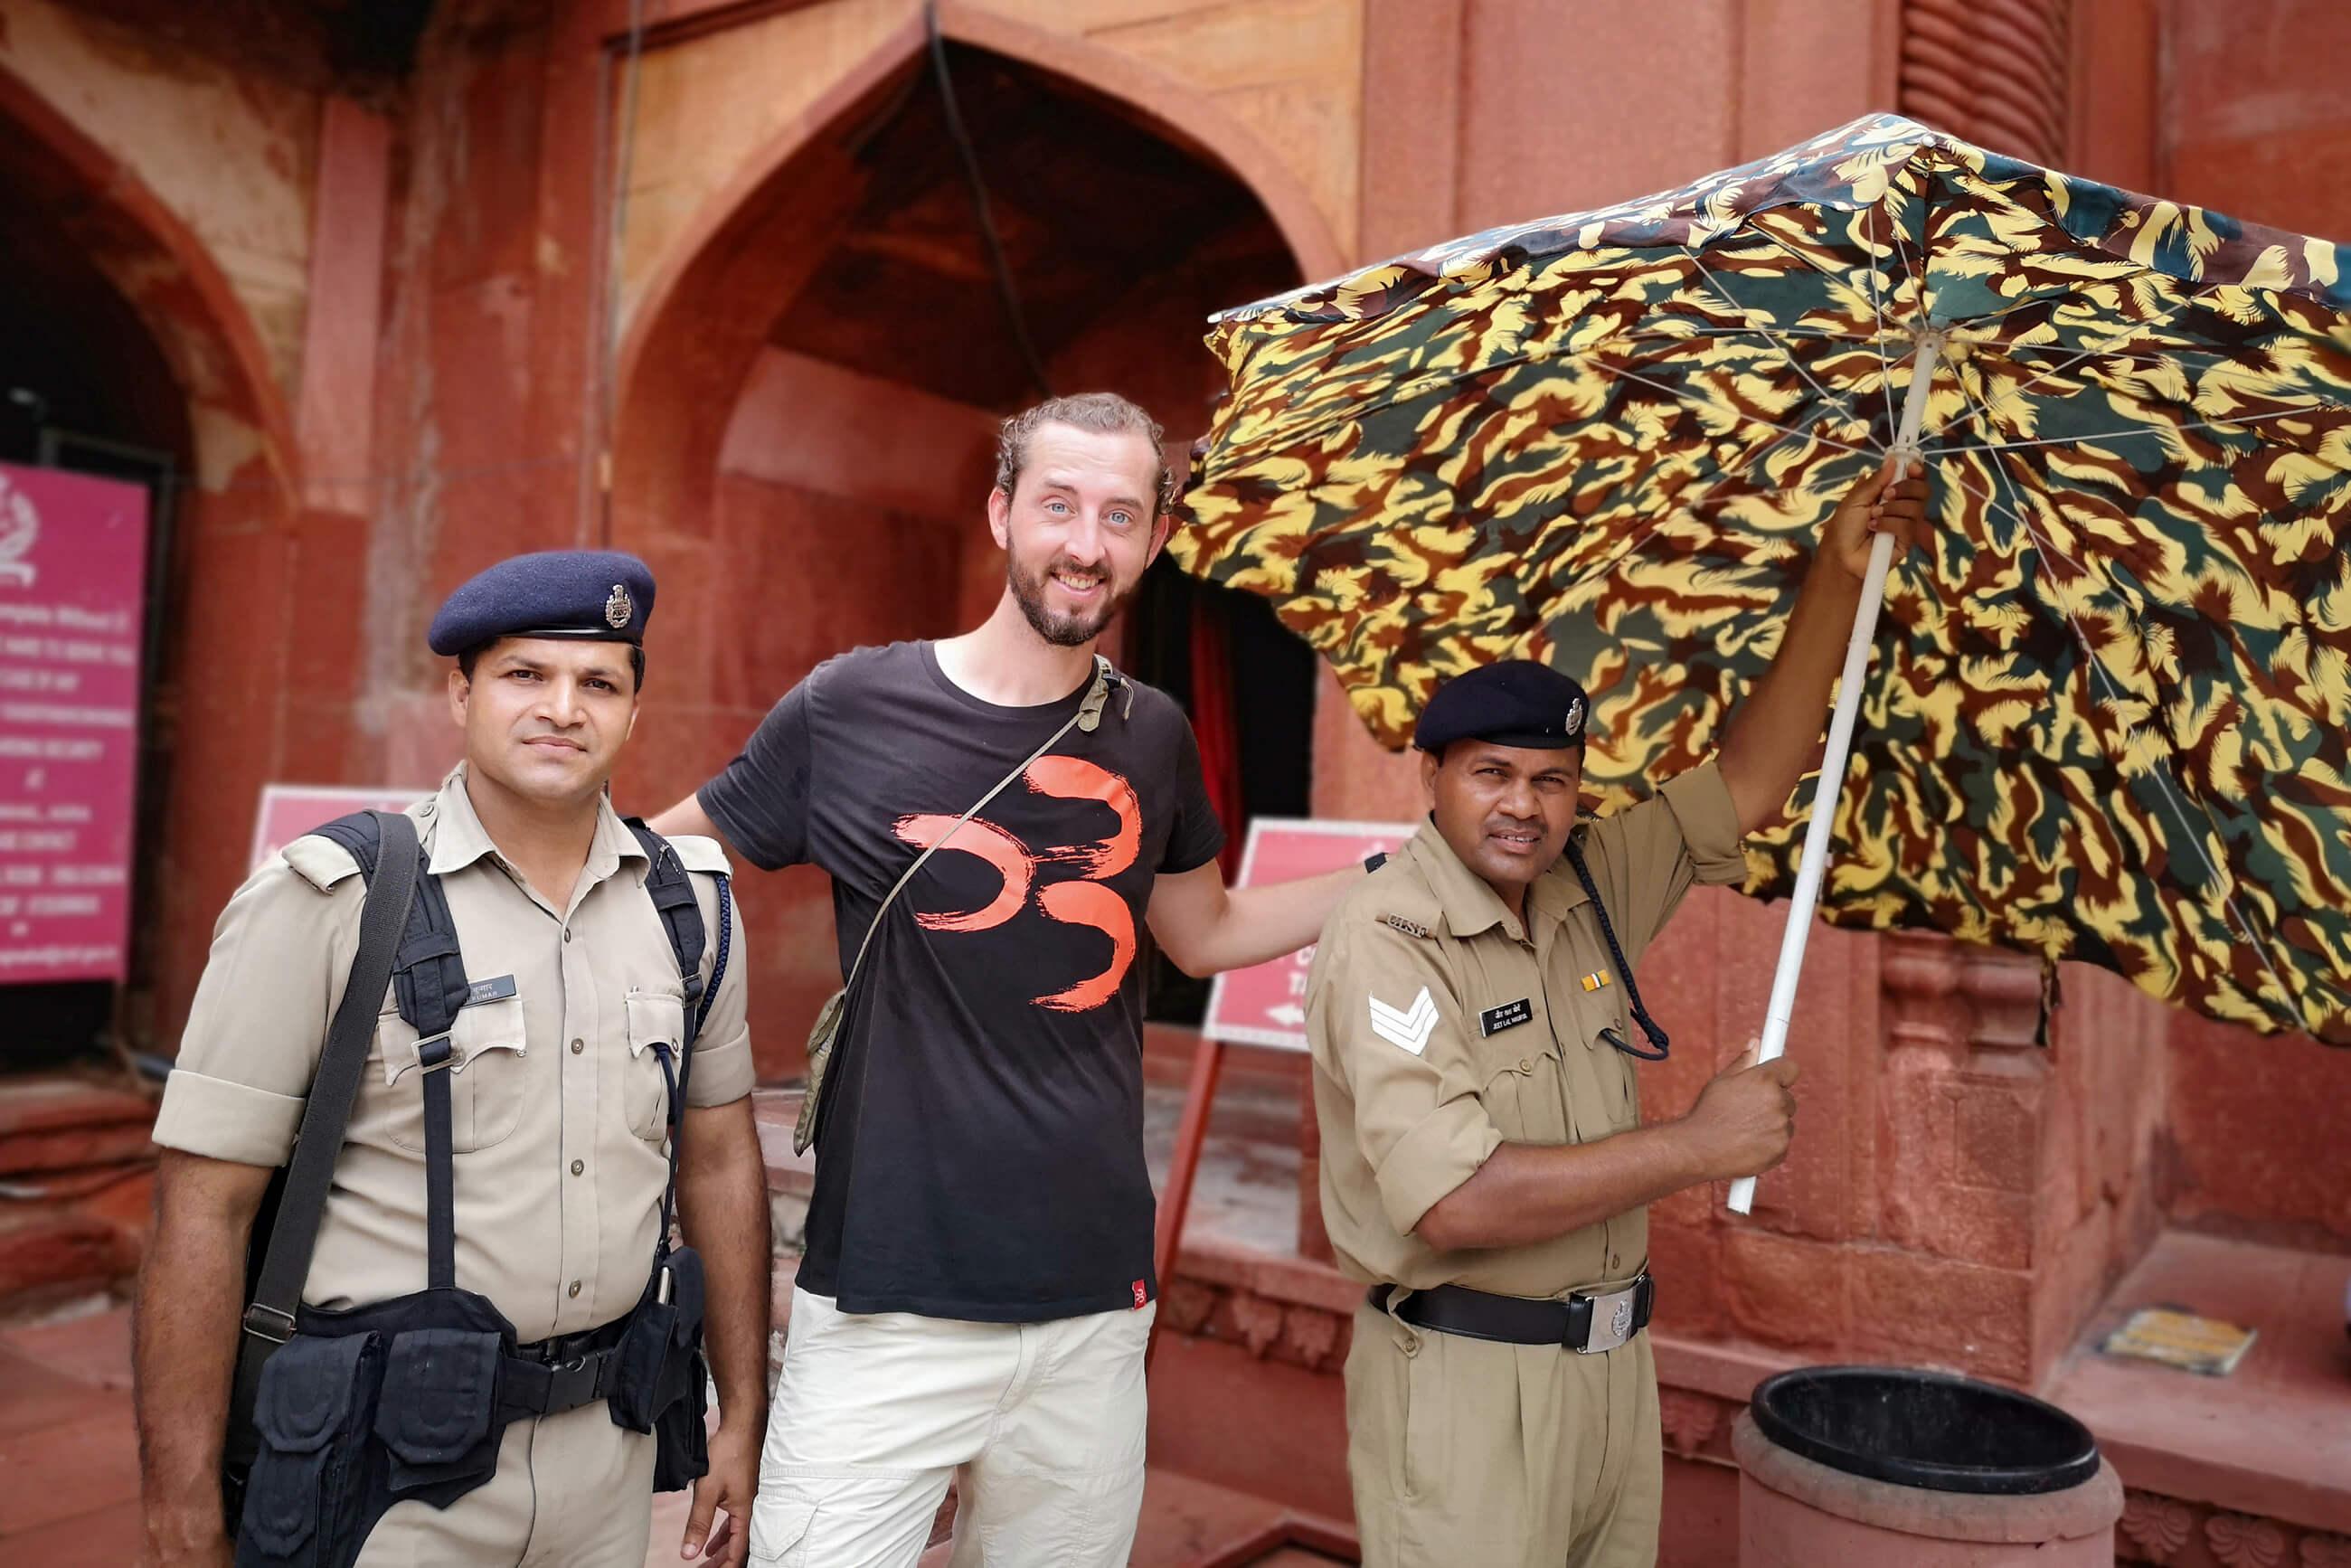 https://bubo.sk/uploads/galleries/16619/janzachar_india_agra_1-1-.jpg